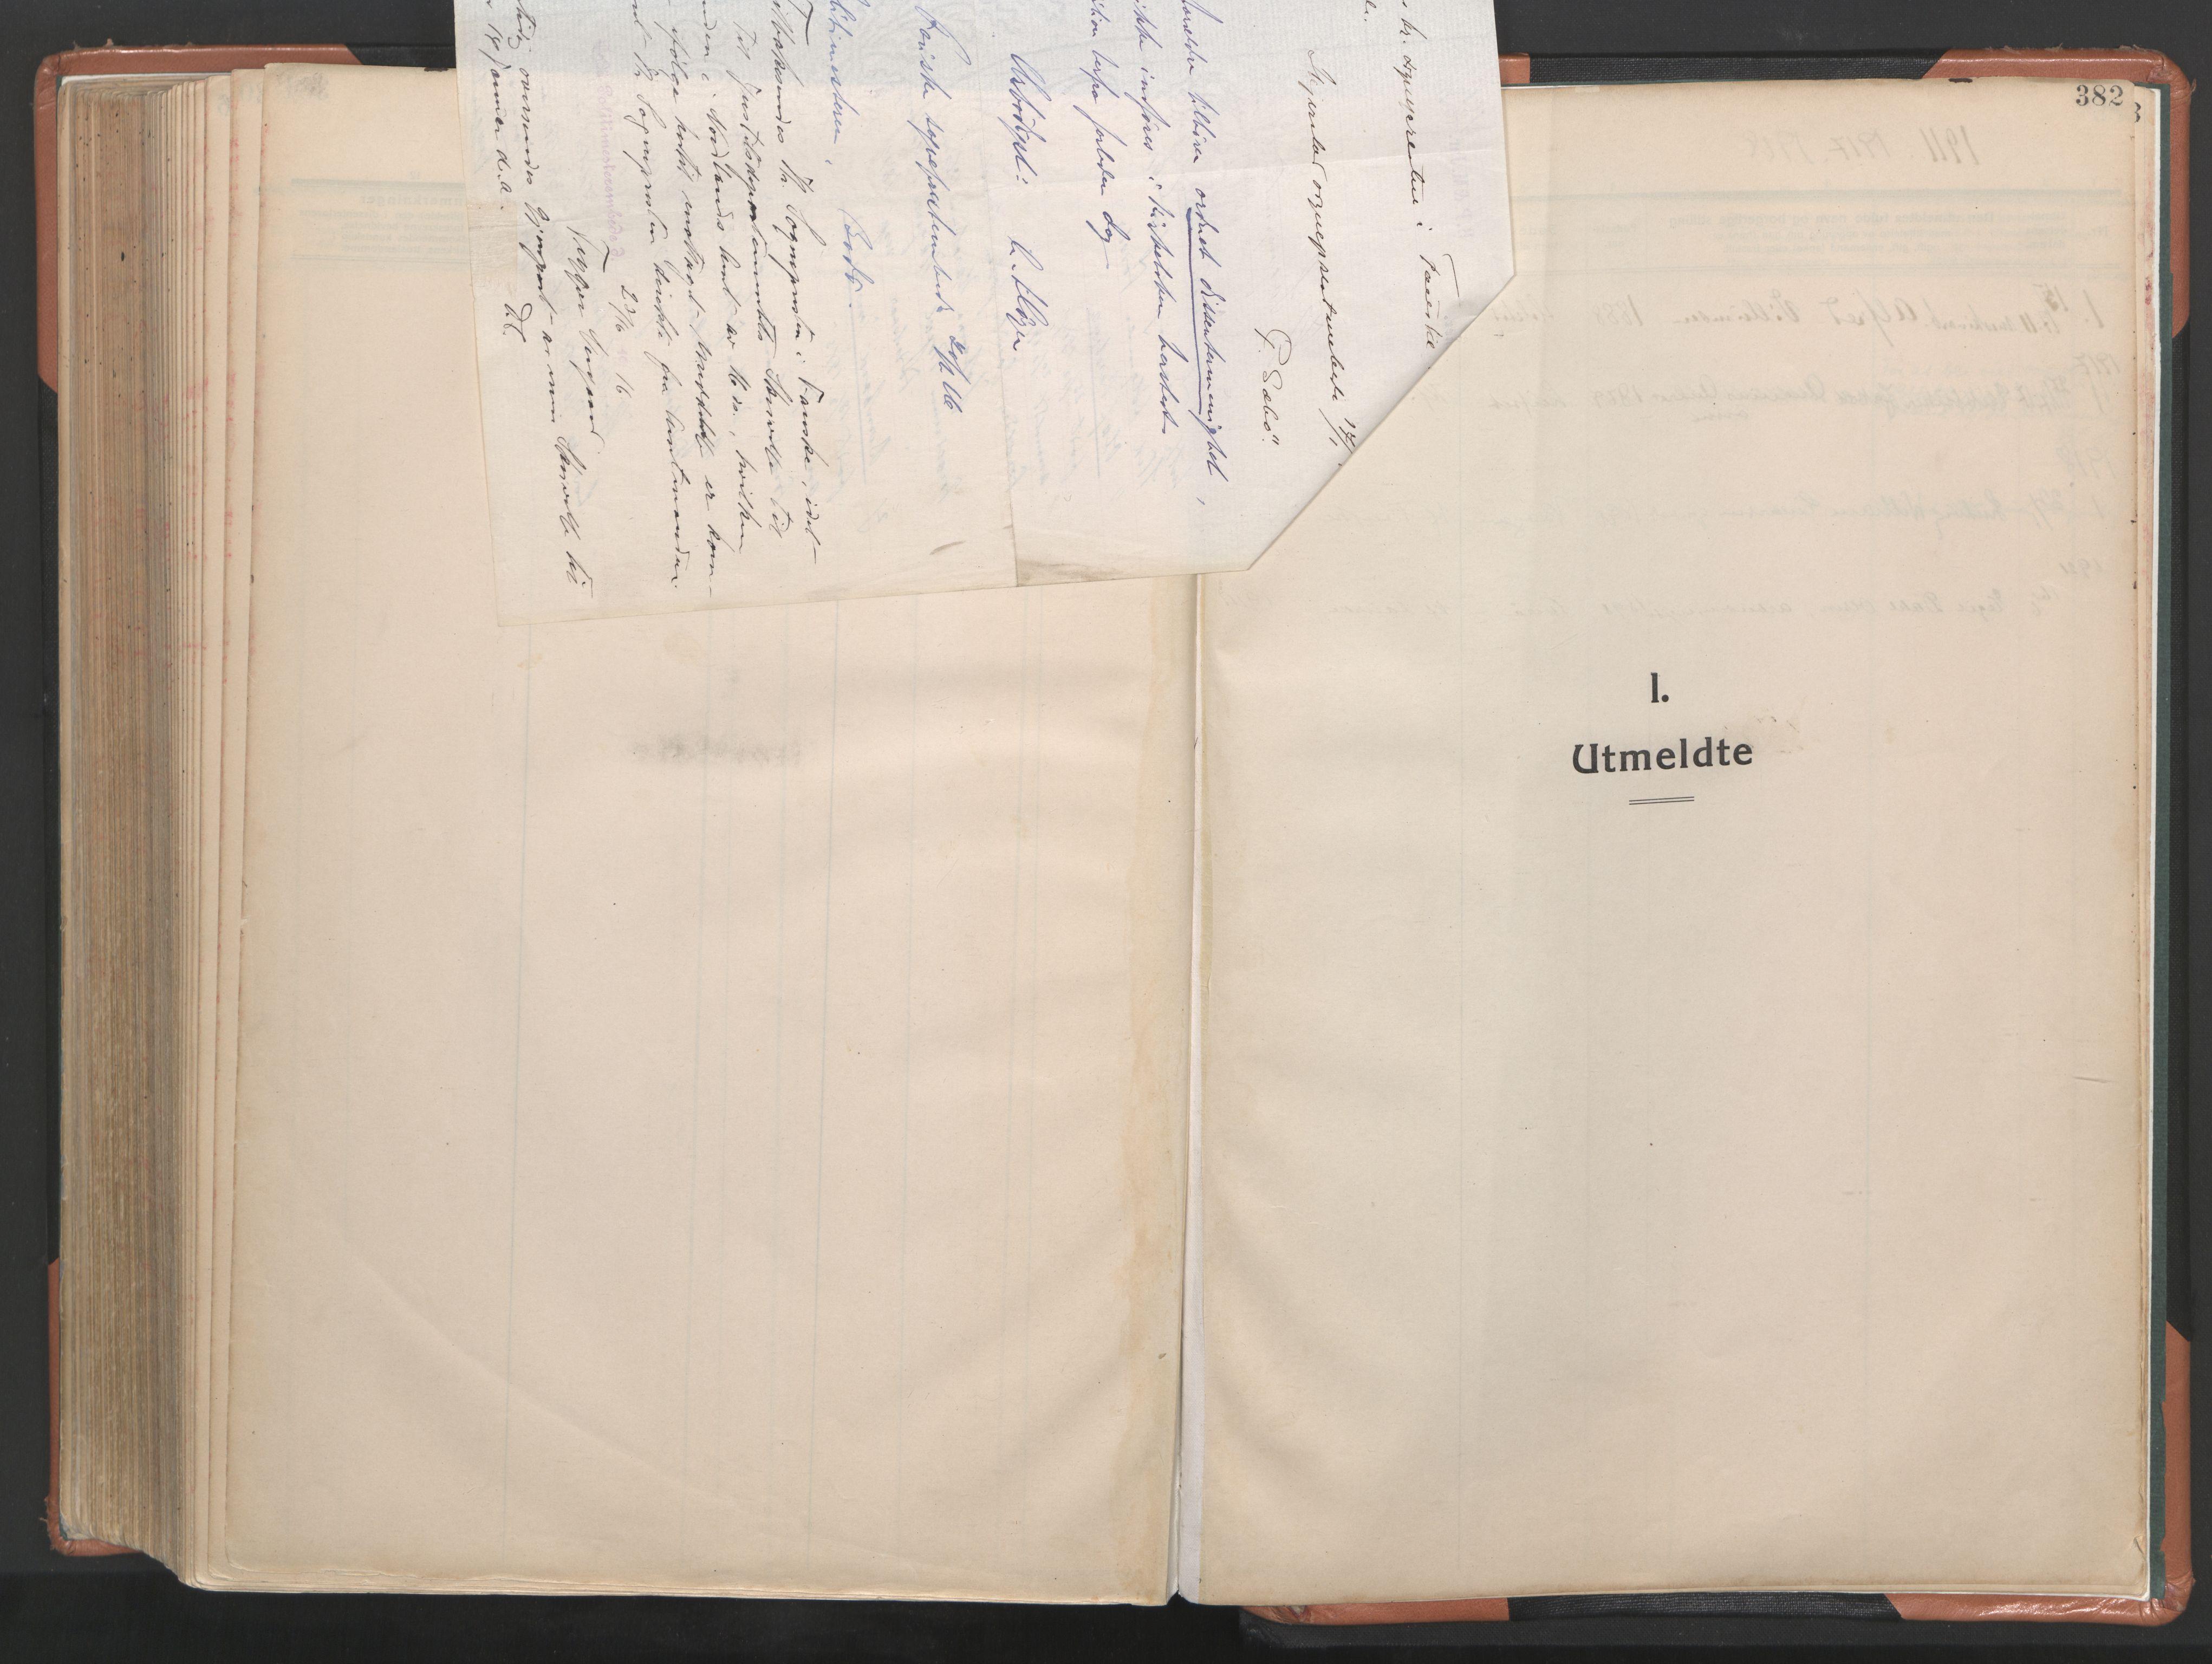 SAT, Ministerialprotokoller, klokkerbøker og fødselsregistre - Nordland, 849/L0698: Ministerialbok nr. 849A09, 1911-1924, s. 382